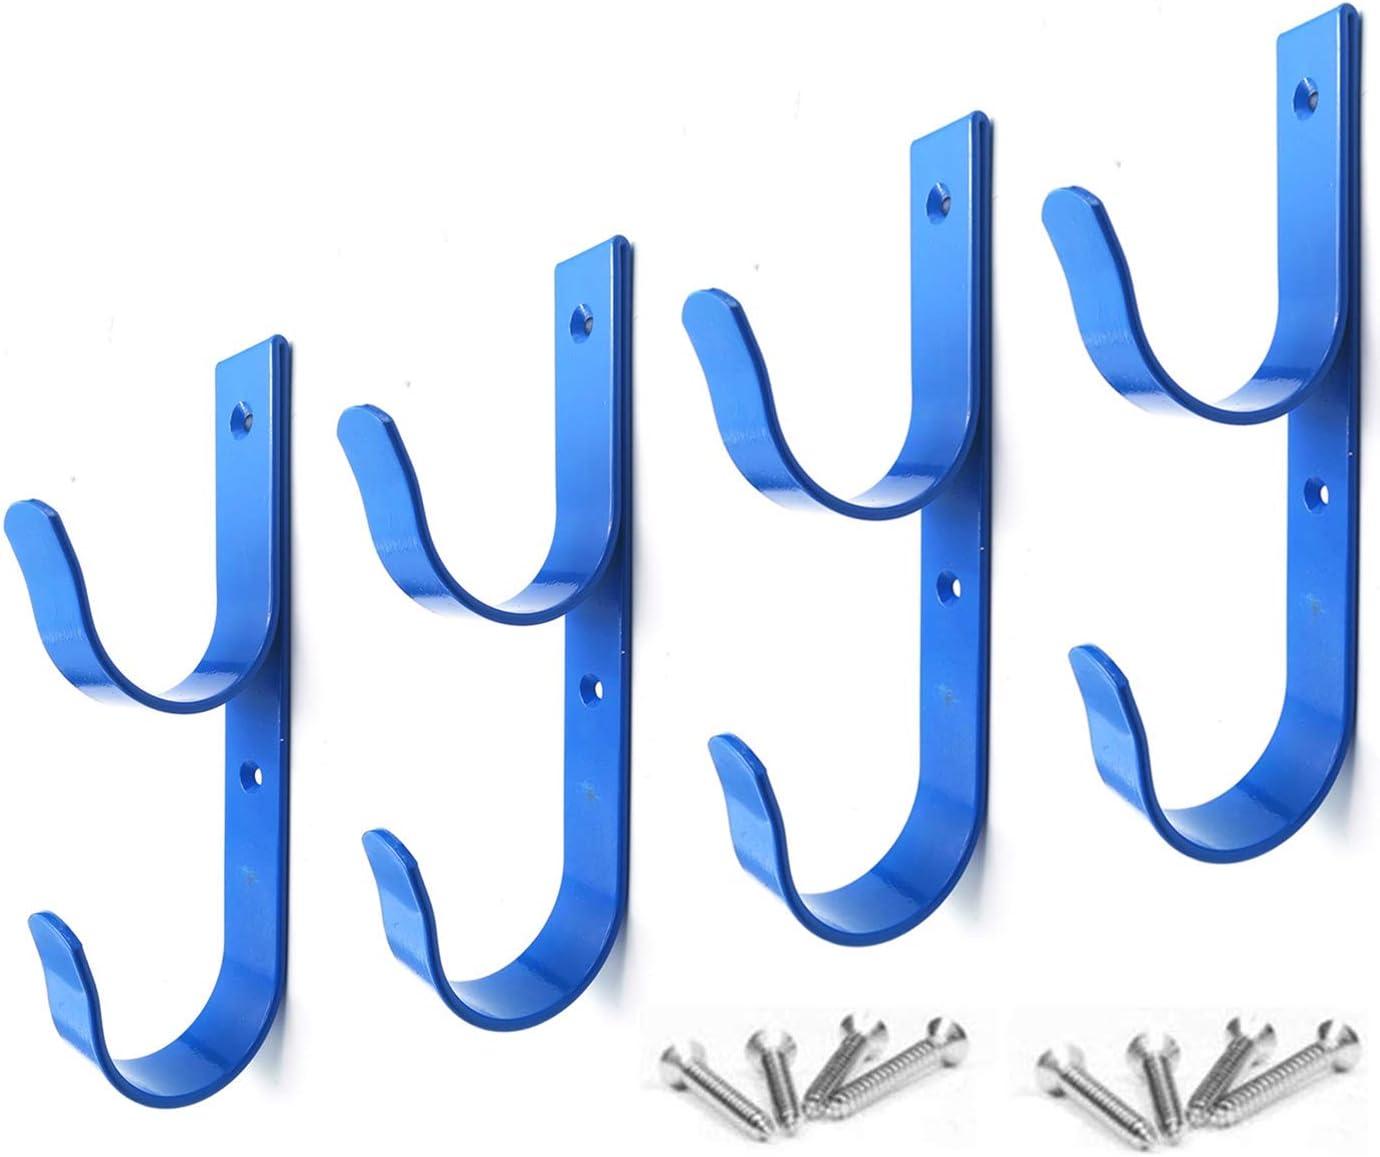 4 PCS Set Wide Pool Pole Hangers Heavy Duty Blue Aluminium Holder Hooks with Screws Perfect Hook Holders for Swimming Pool,Telescopic Poles,Skimmers,Nets Brushes,Vacuum Hose,Garden Equipment Etc